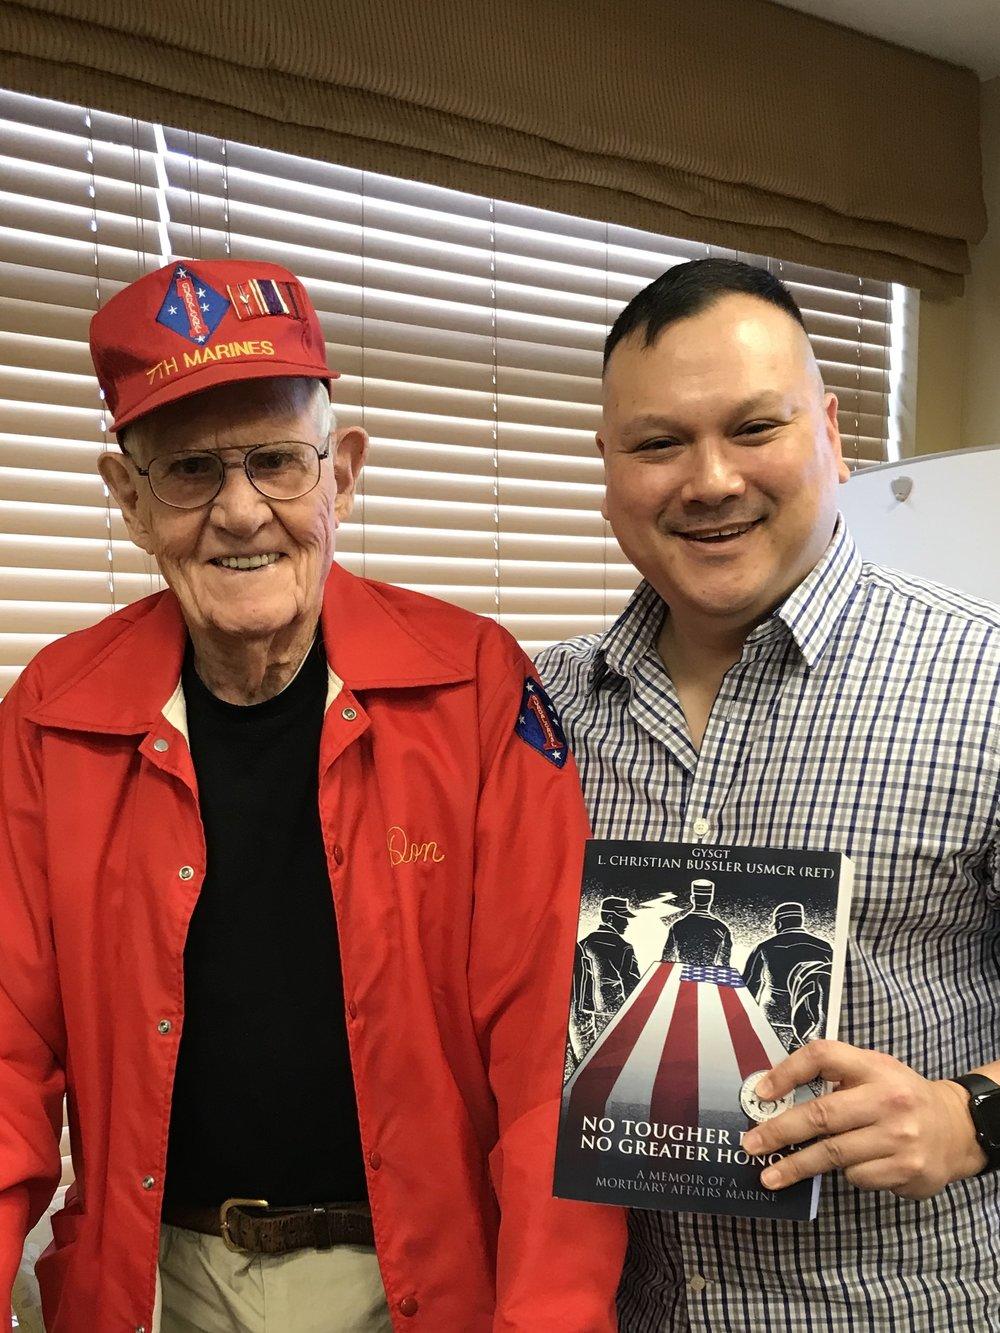 Mr Don Barrett. WWII Marine combat veteran of the legendary battles of Guadalcanal, Gloucester, Peleliu, and Saipan!!!! A TRUE AMERICAN HERO